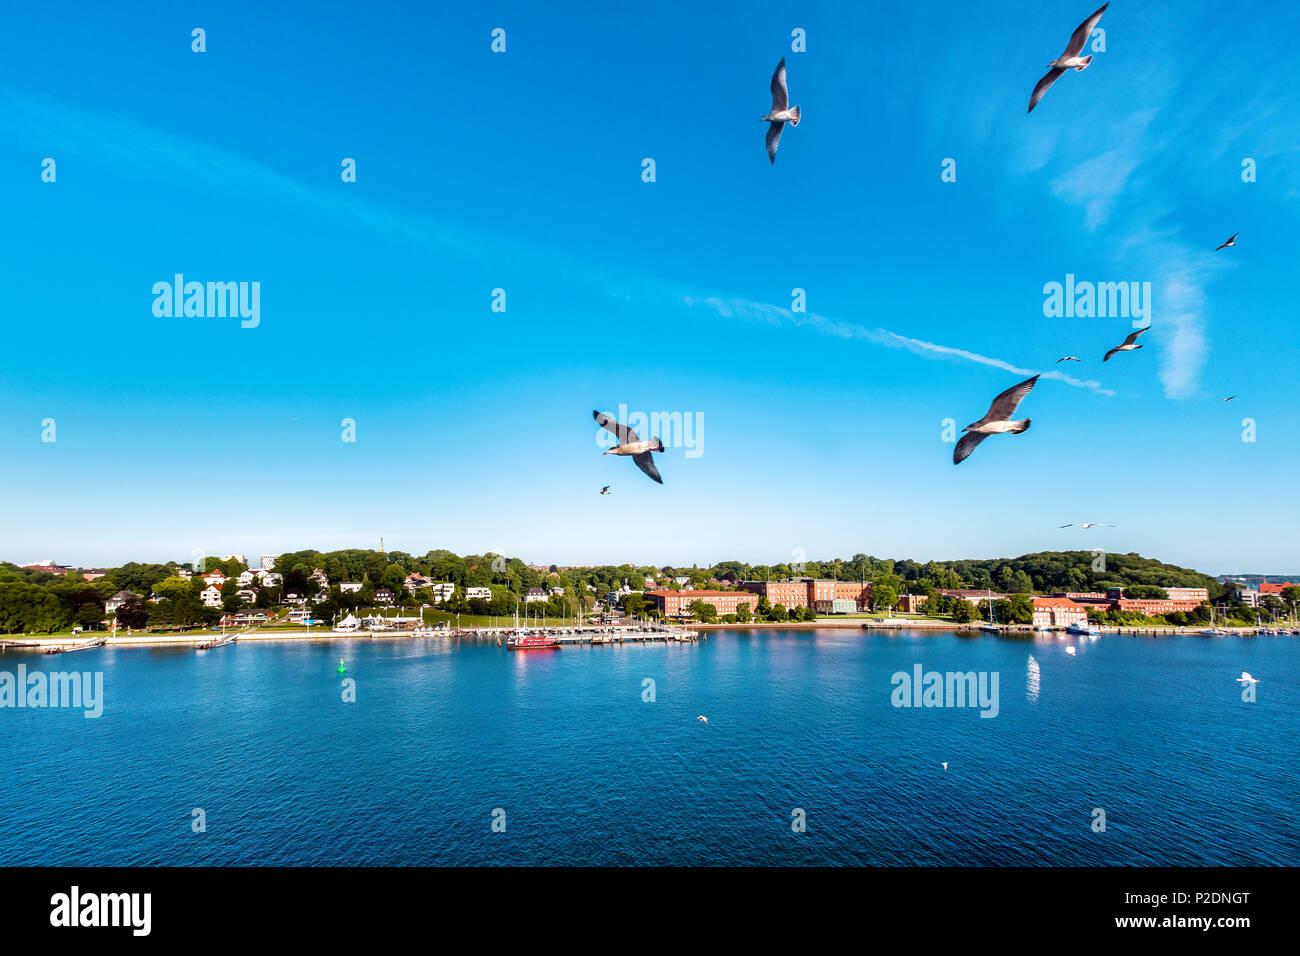 View towards parliament, Kiel, Baltic Coast, Schleswig-Holstein, Germany - Stock Image